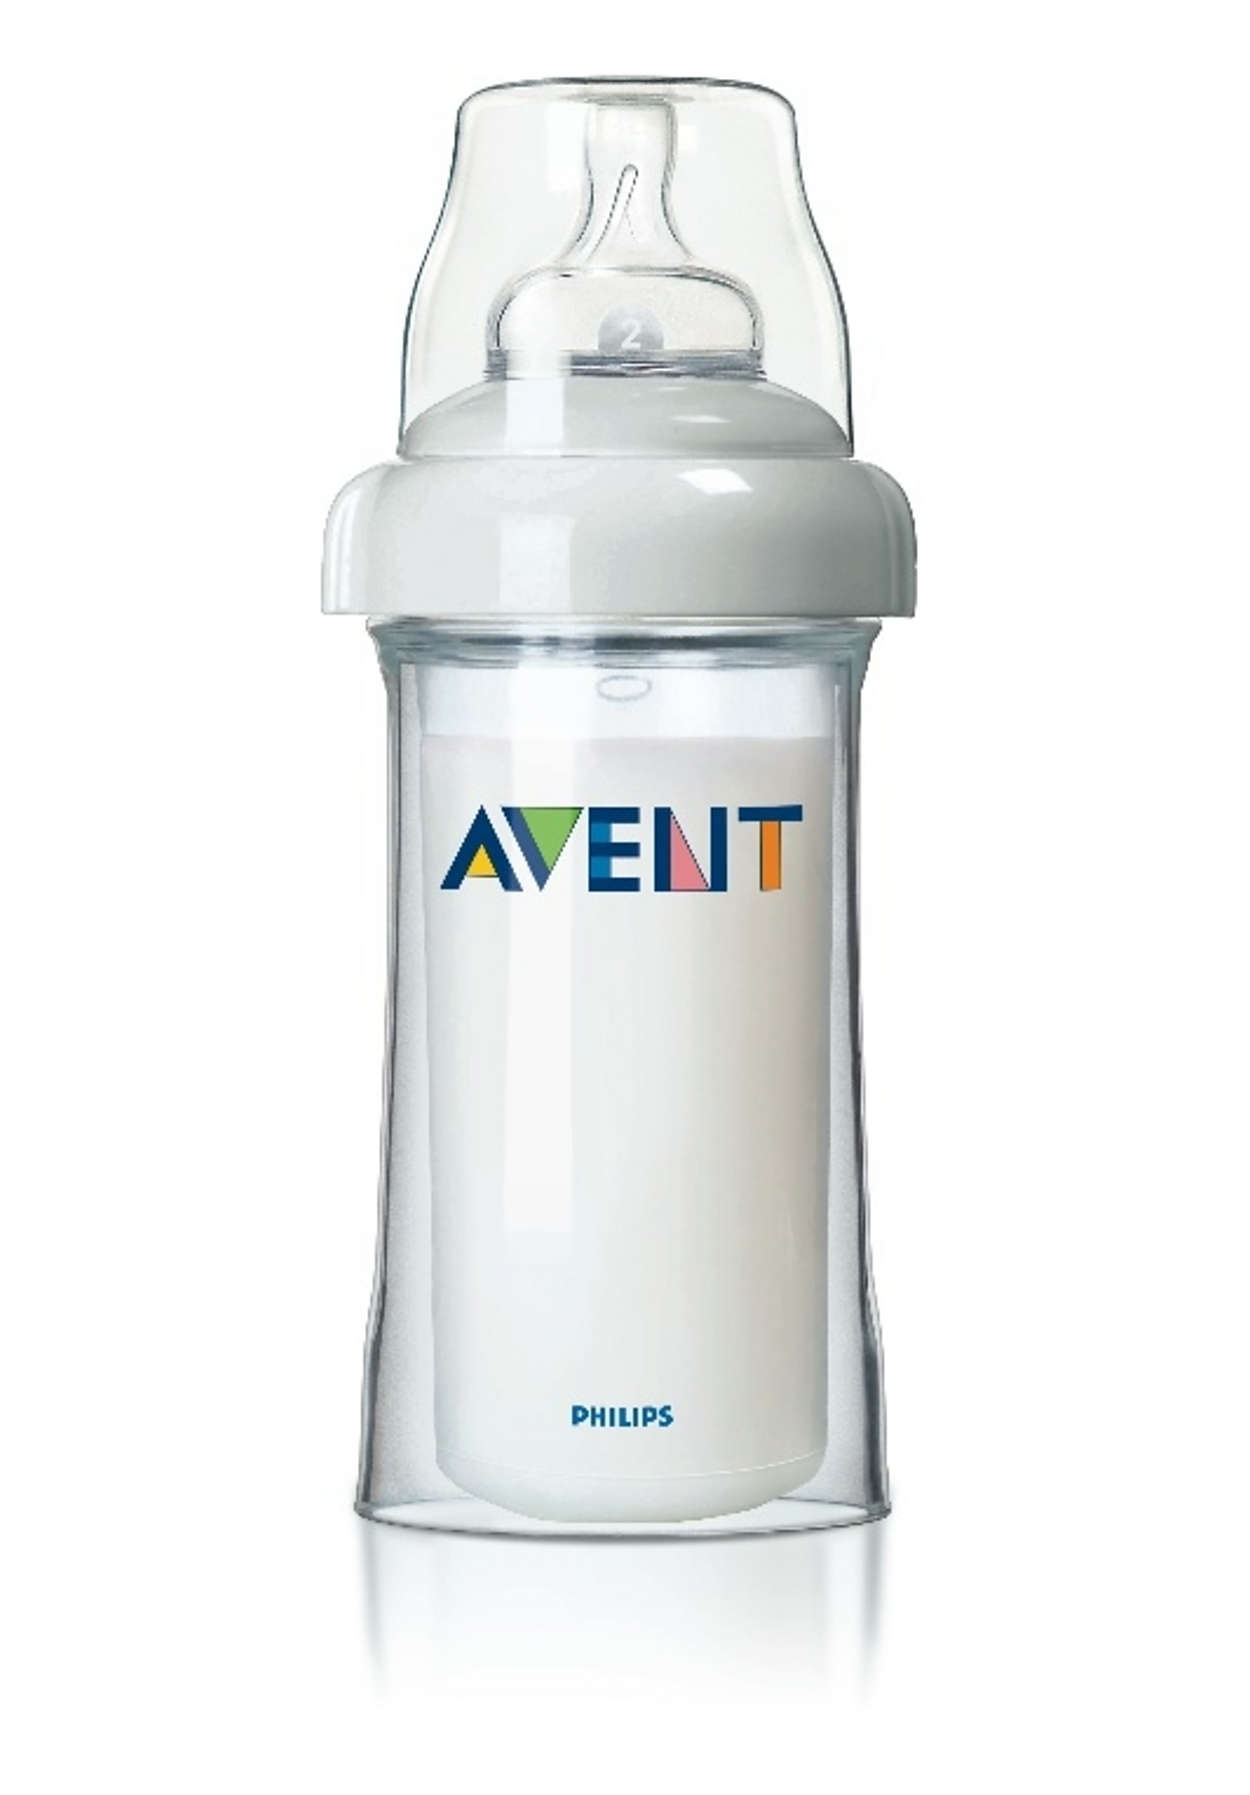 For convenient, healthy feeding